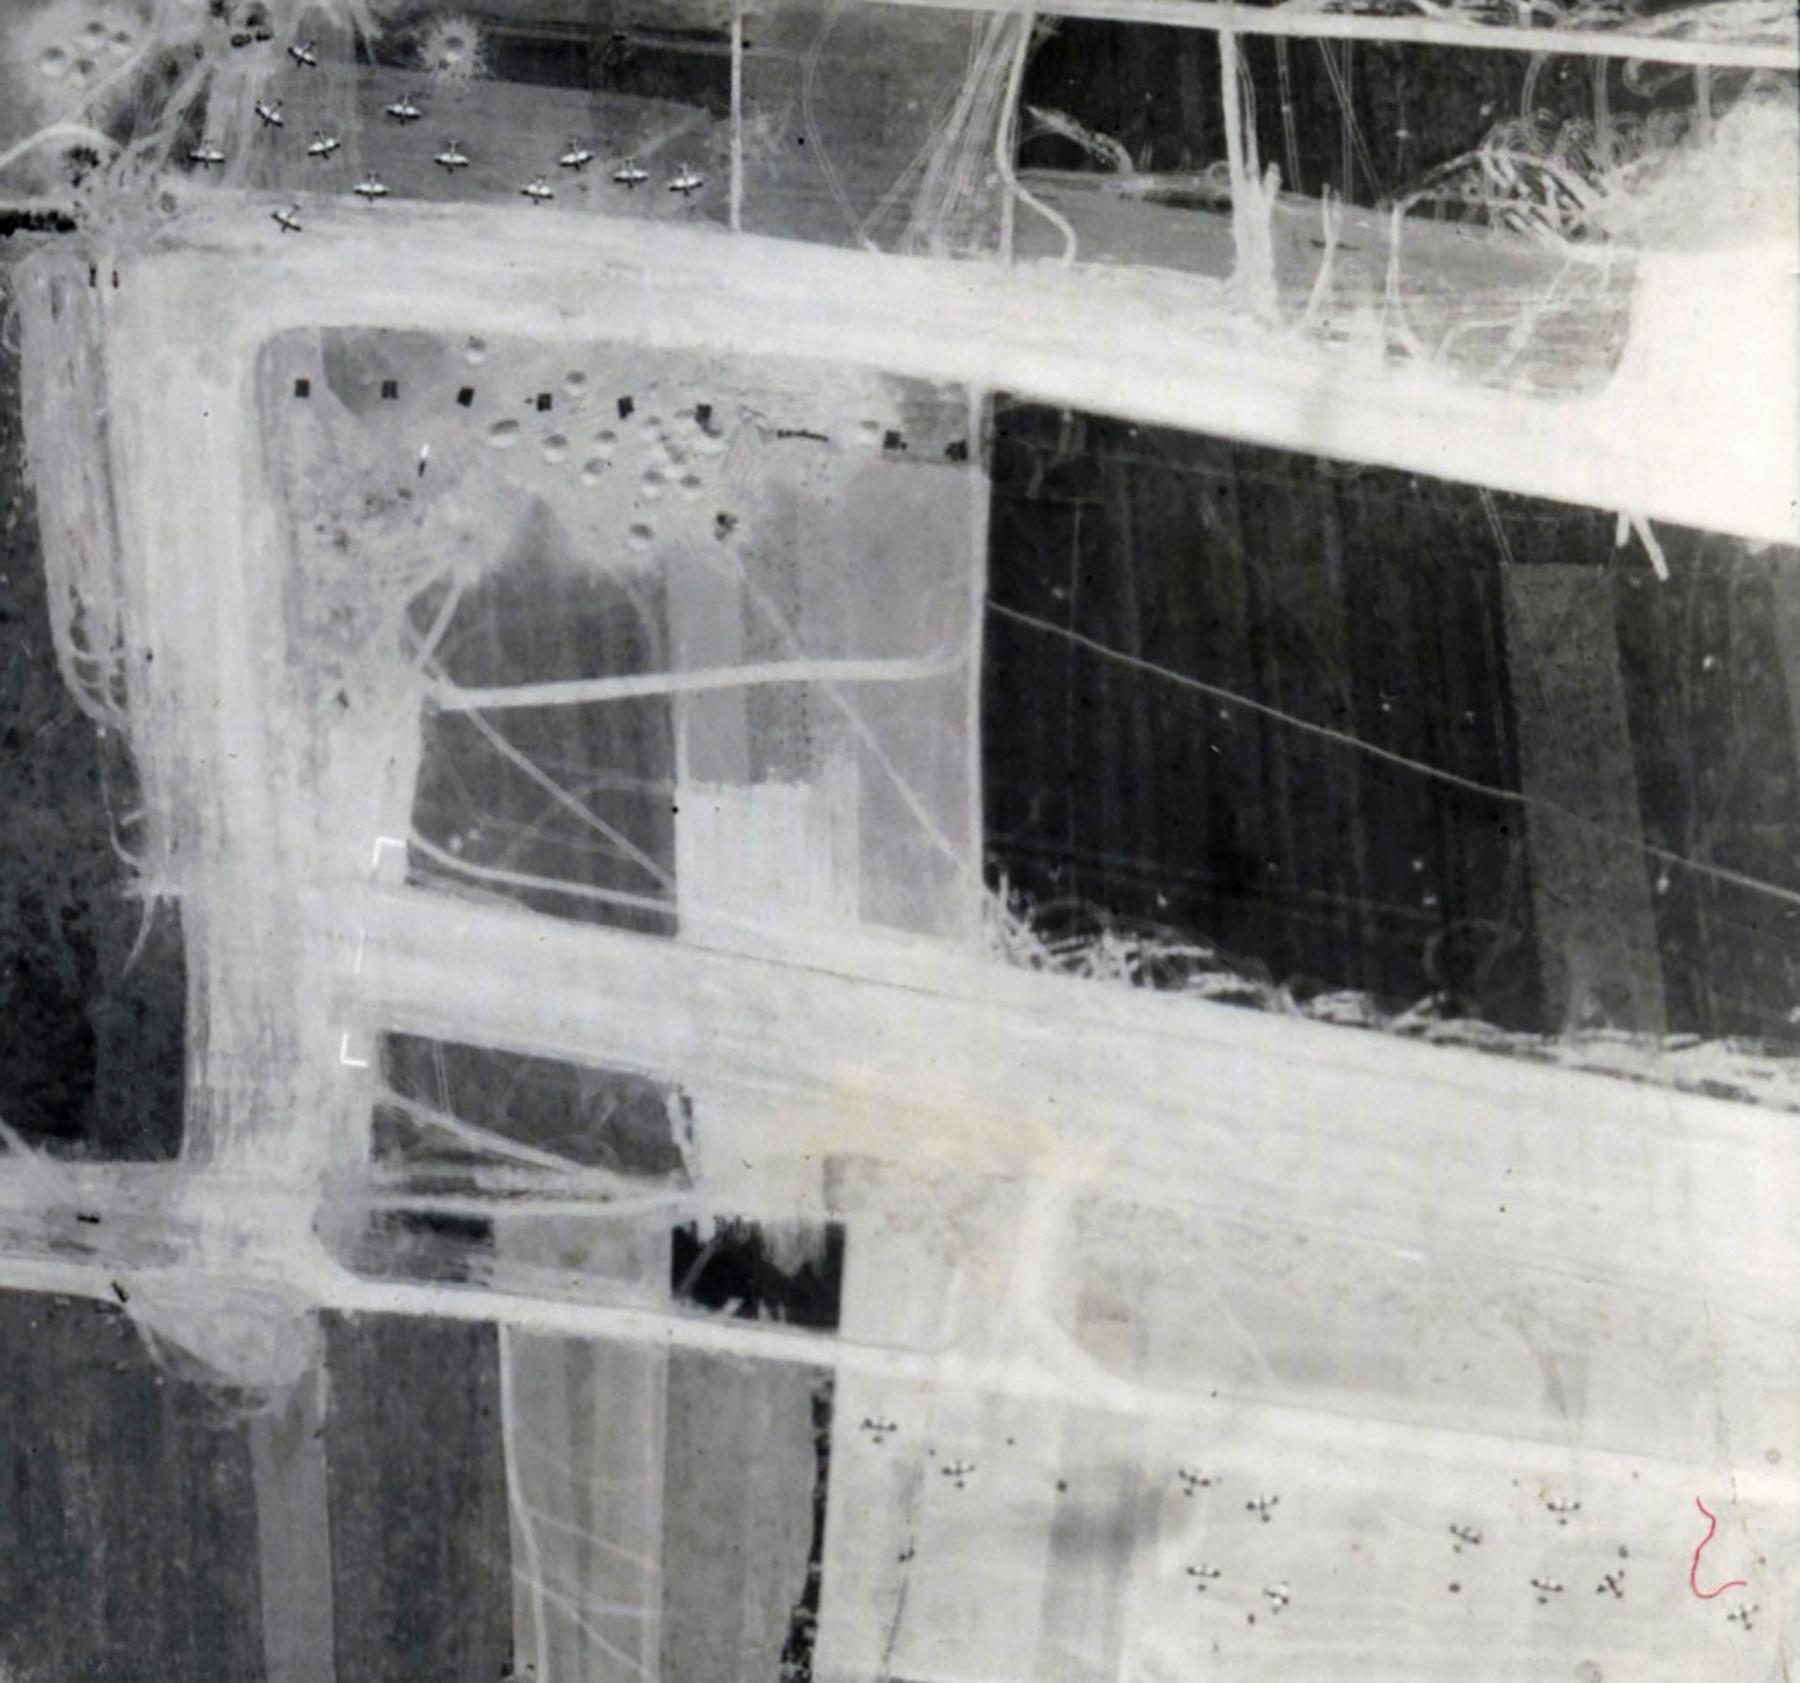 USAAAF 7PG22FS aerial recon photo to ALG B3 Sainte Croix sur Mer June 12 1944 02